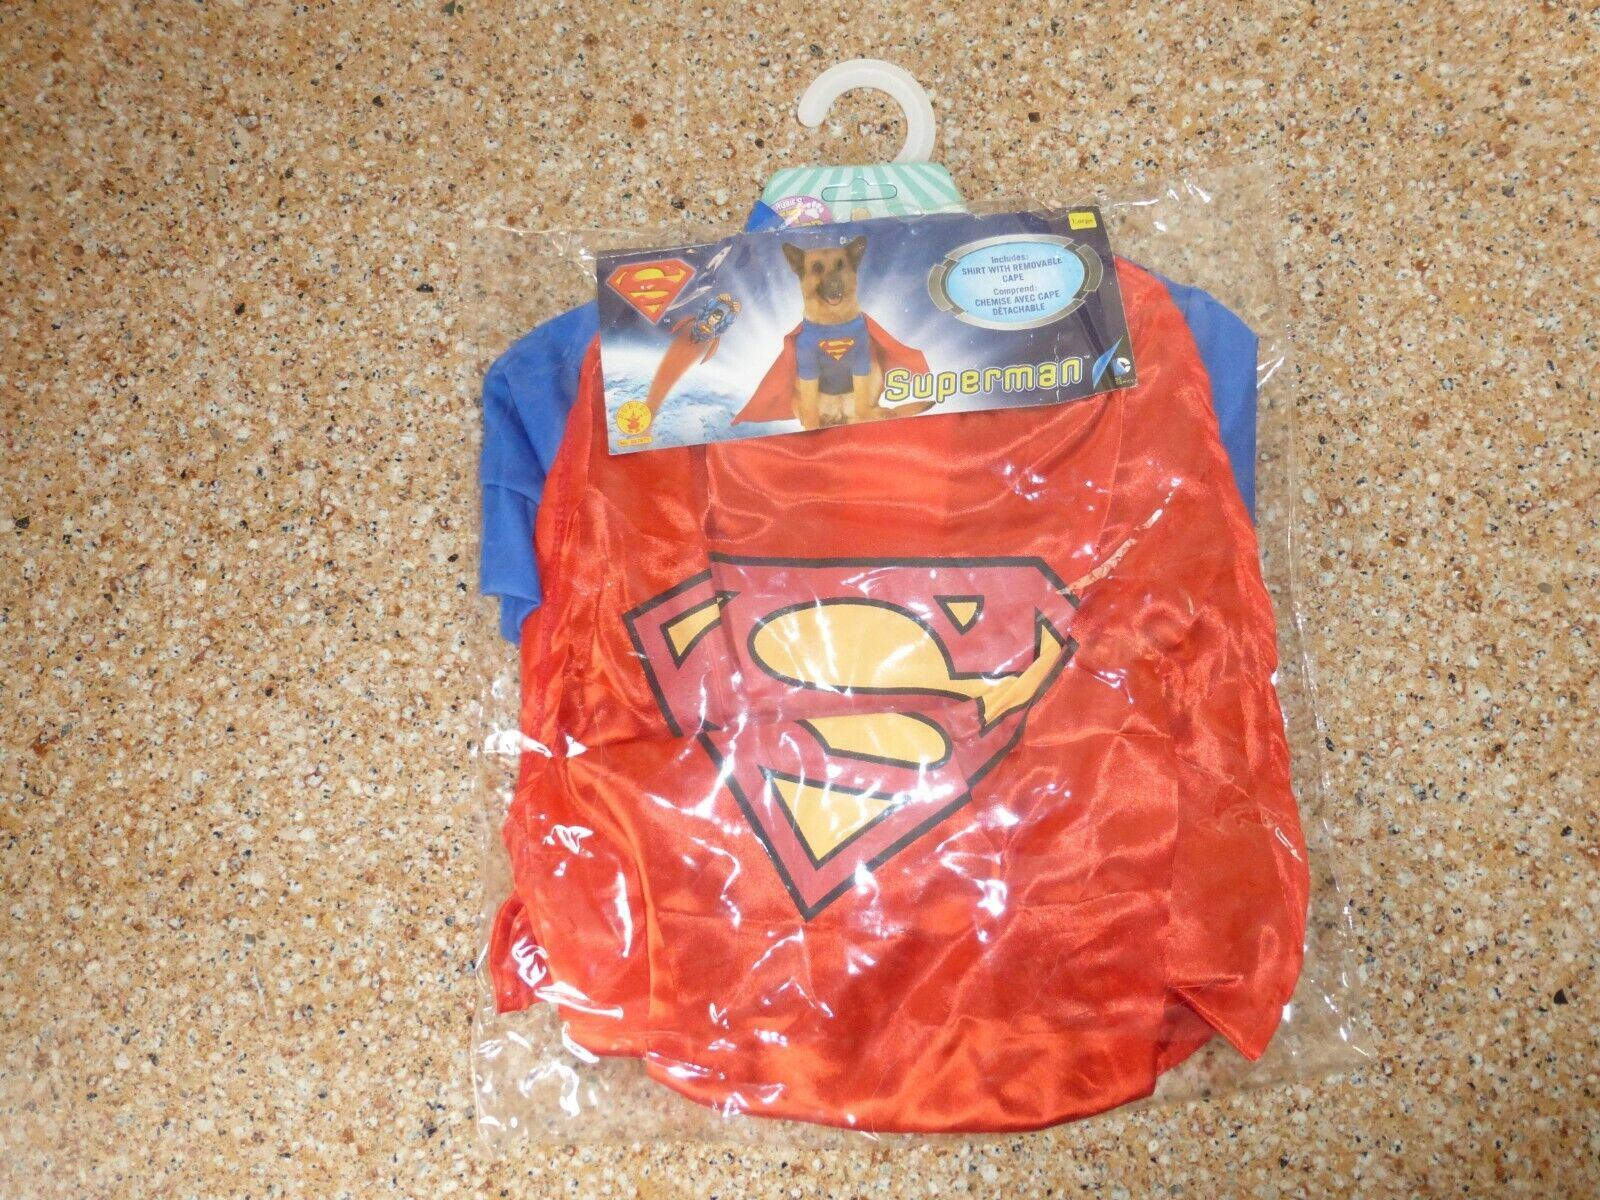 Superman Dog Costume W/ Cape Size Large Good For Cocker Spaniel Or Beagle - $12.50